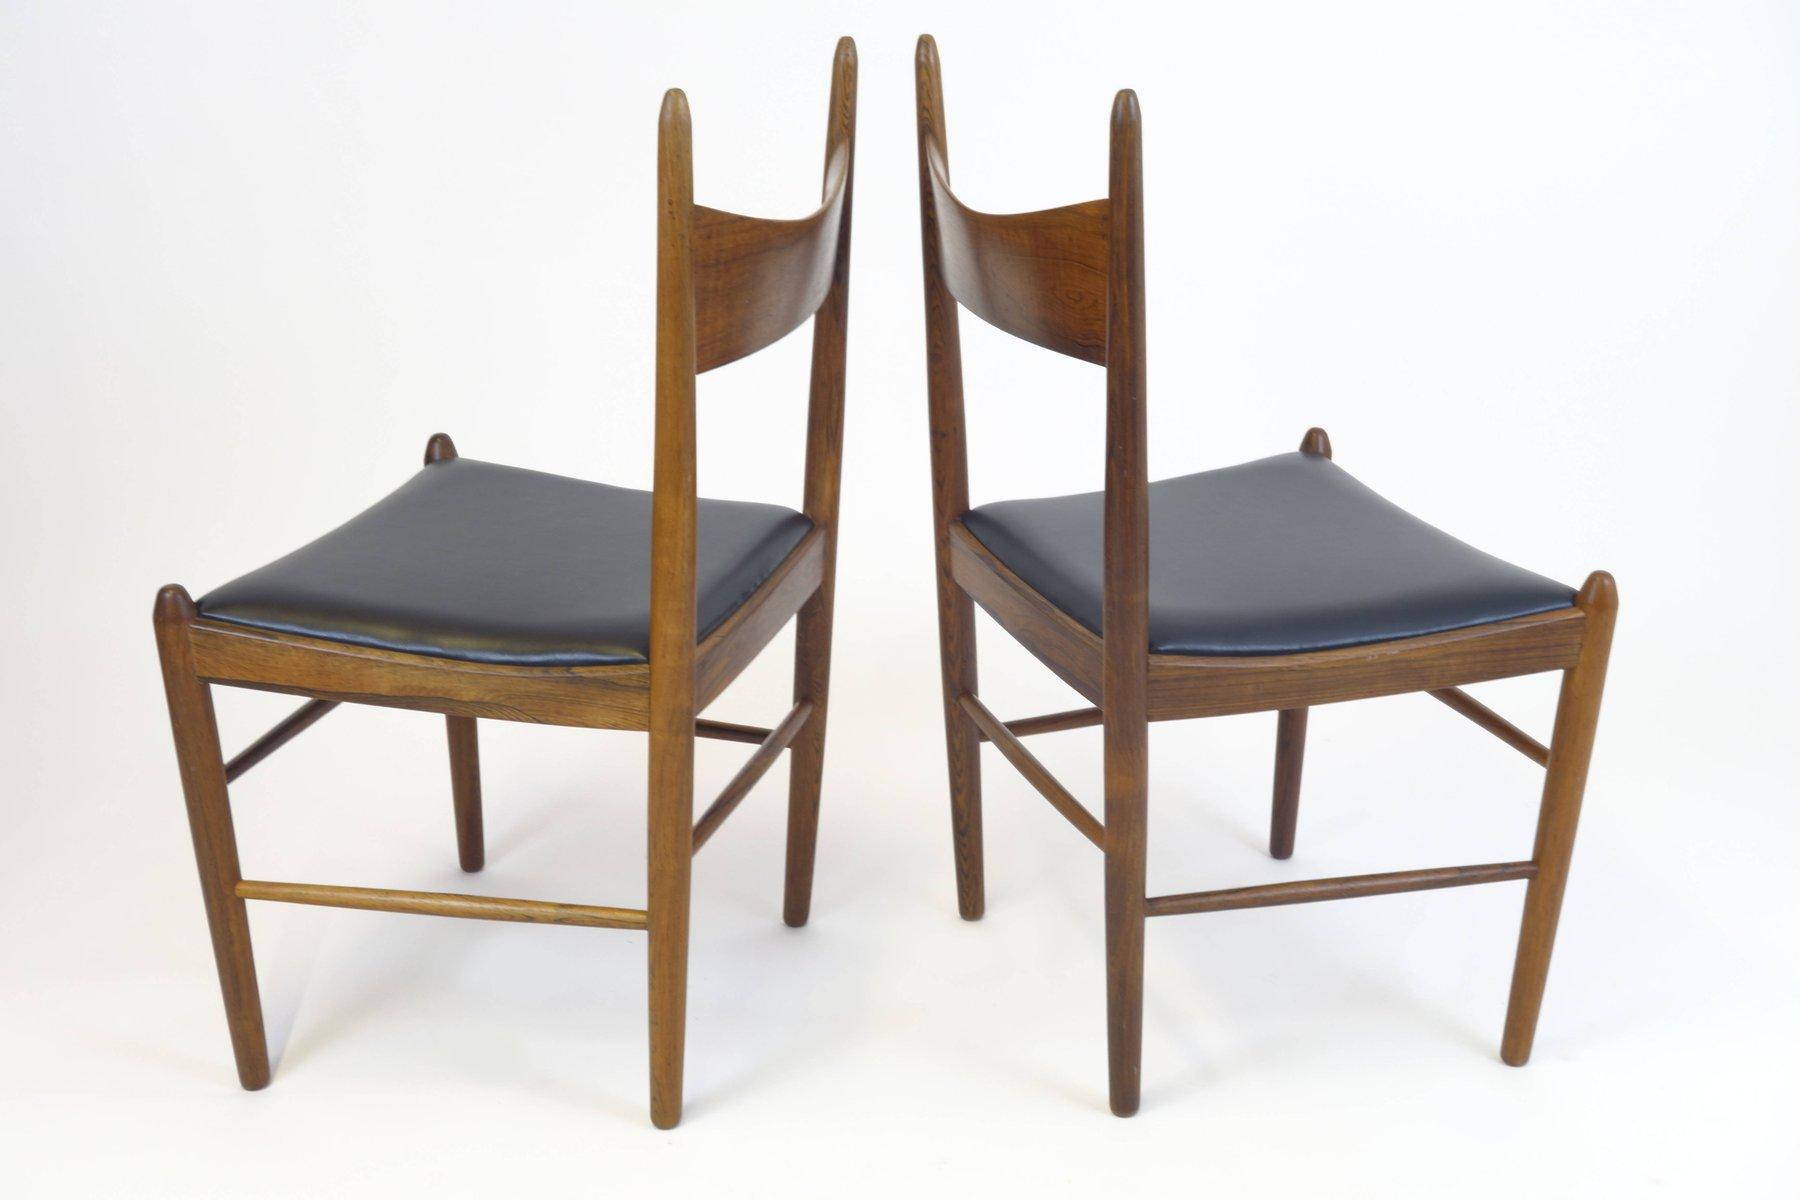 esszimmerst hle von illum wikkelso f r vestervig eriksen. Black Bedroom Furniture Sets. Home Design Ideas